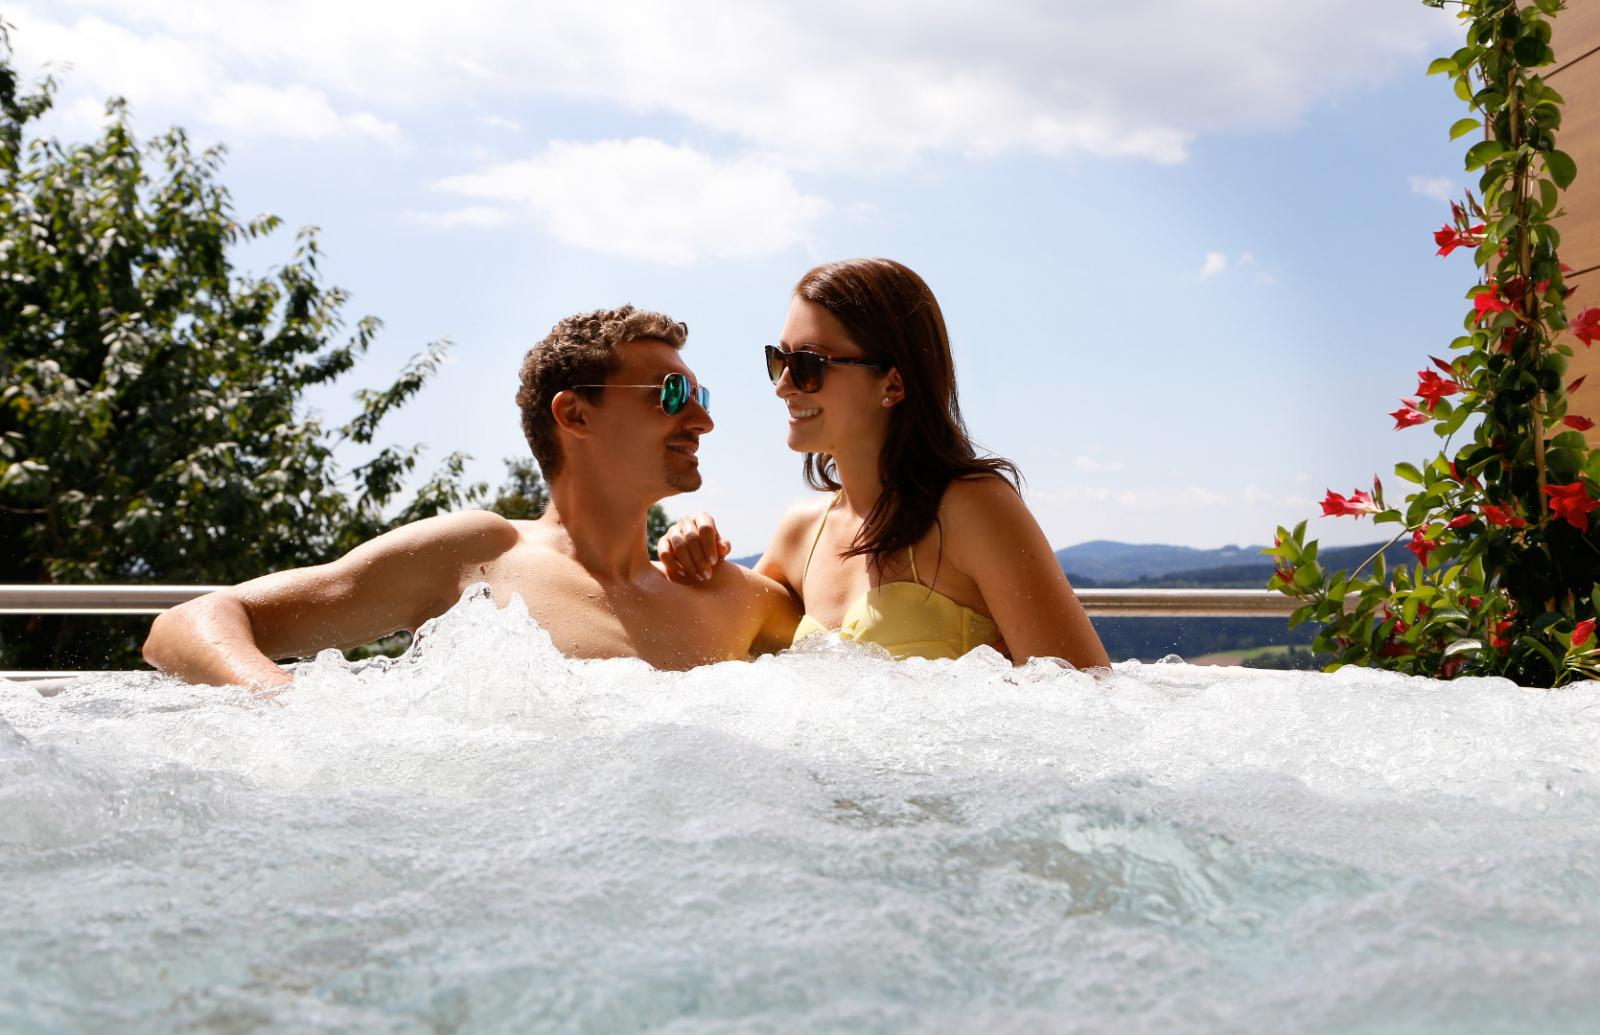 Wellnessangebot im Thula Wellness-Hotel Bayerischer Wald | Lalling, Bayern